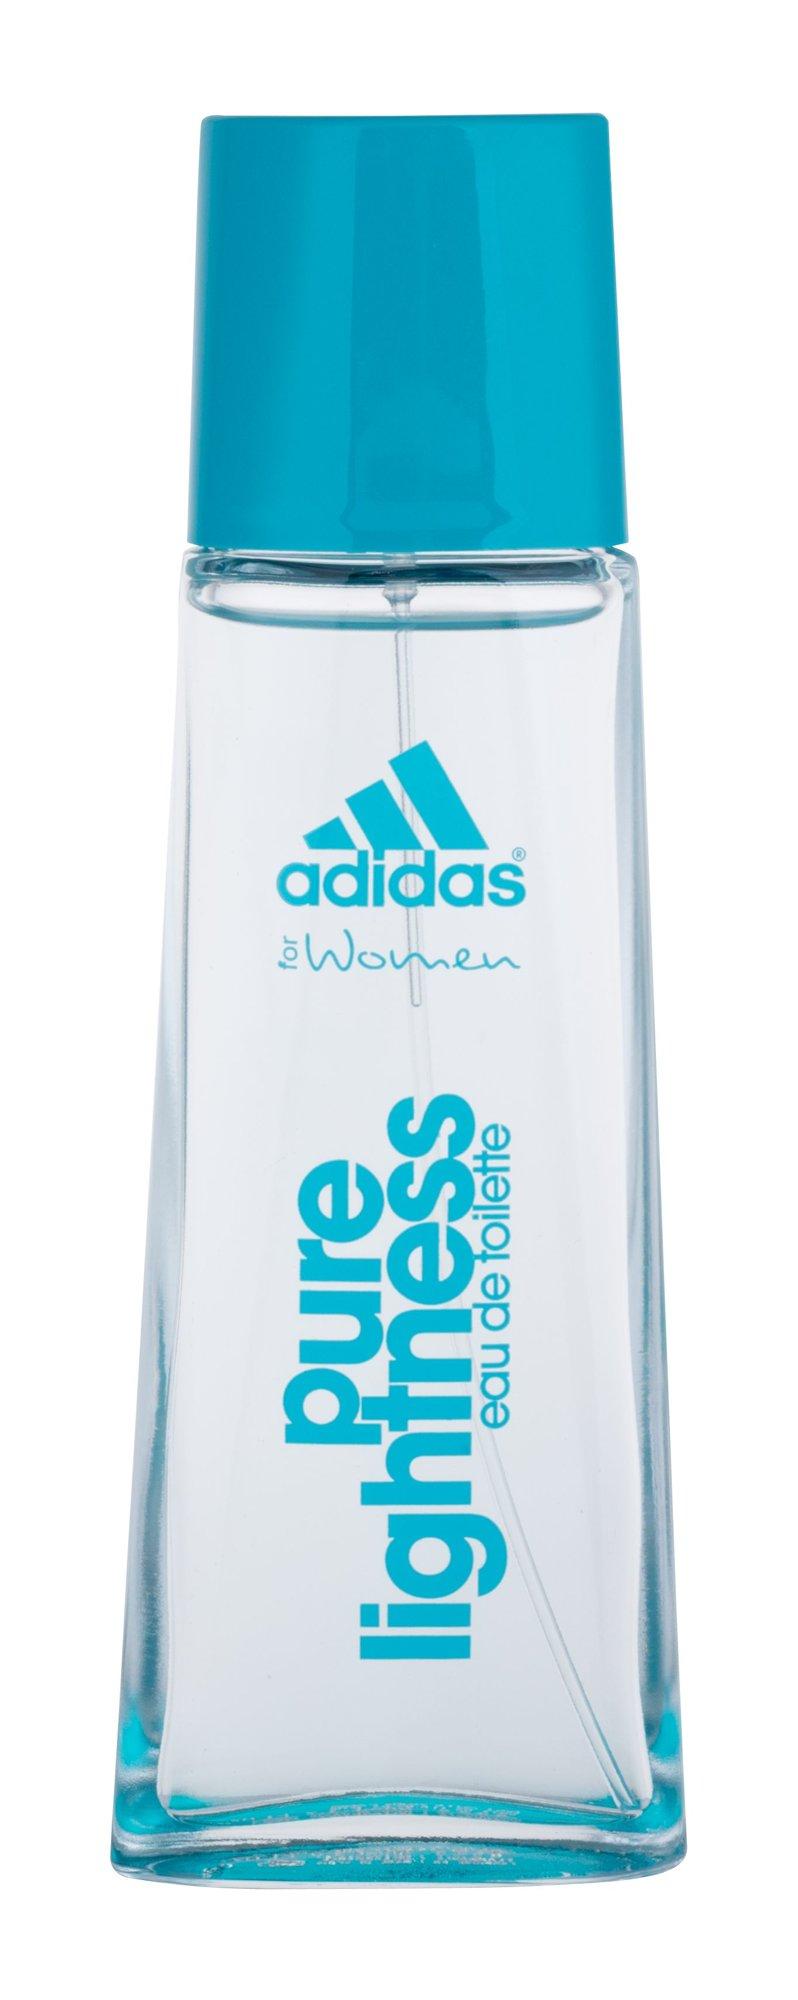 Adidas Pure Lightness For Women Eau de Toilette 50ml